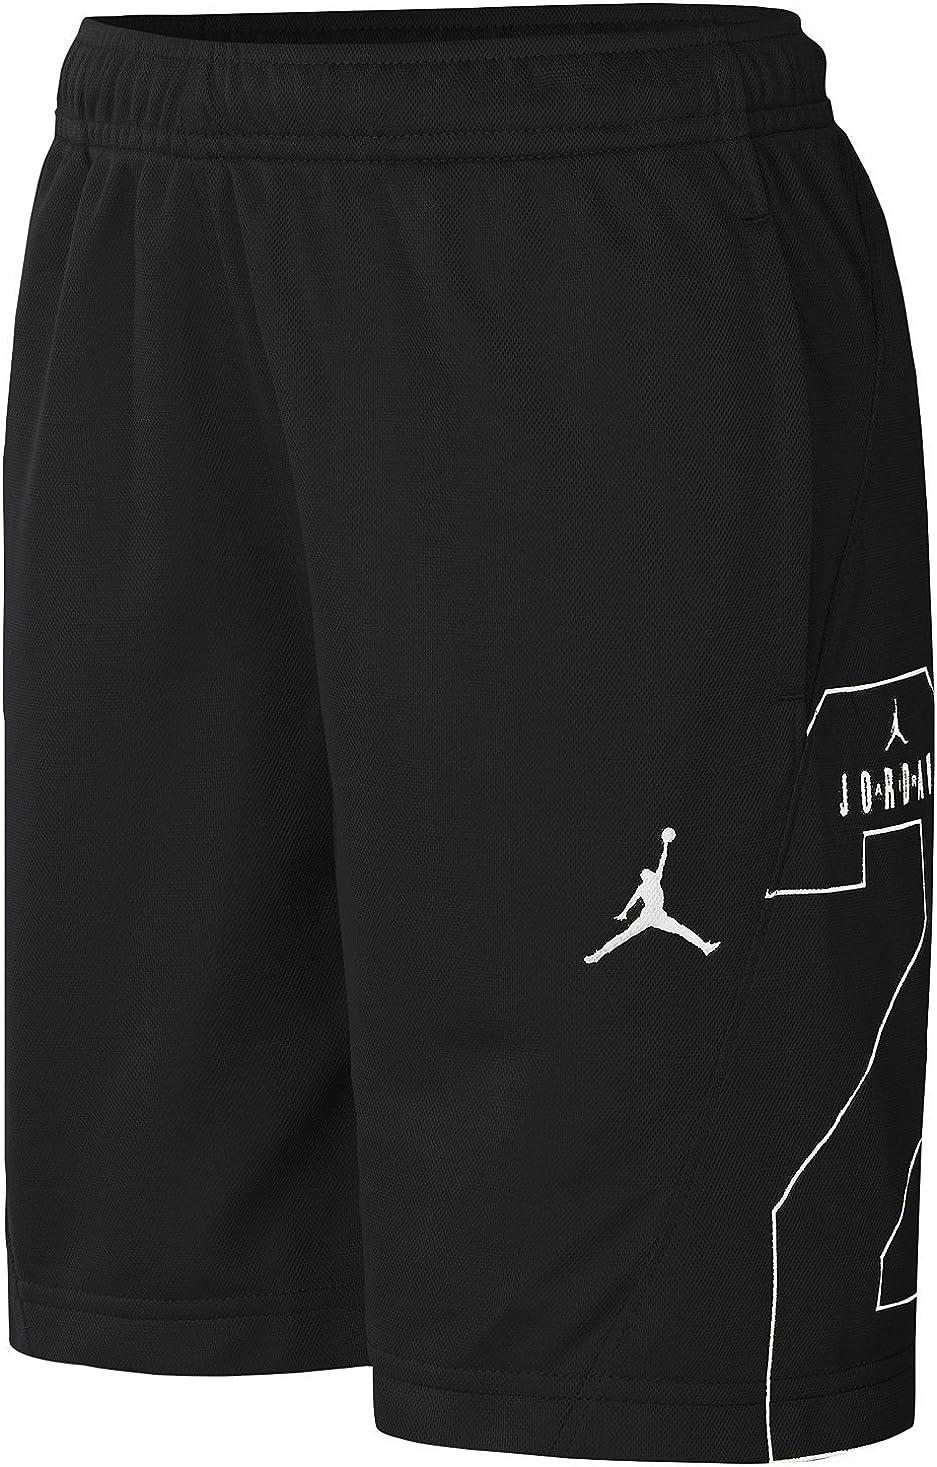 Nike Jordan Boys' Two-Three Basketball Shorts